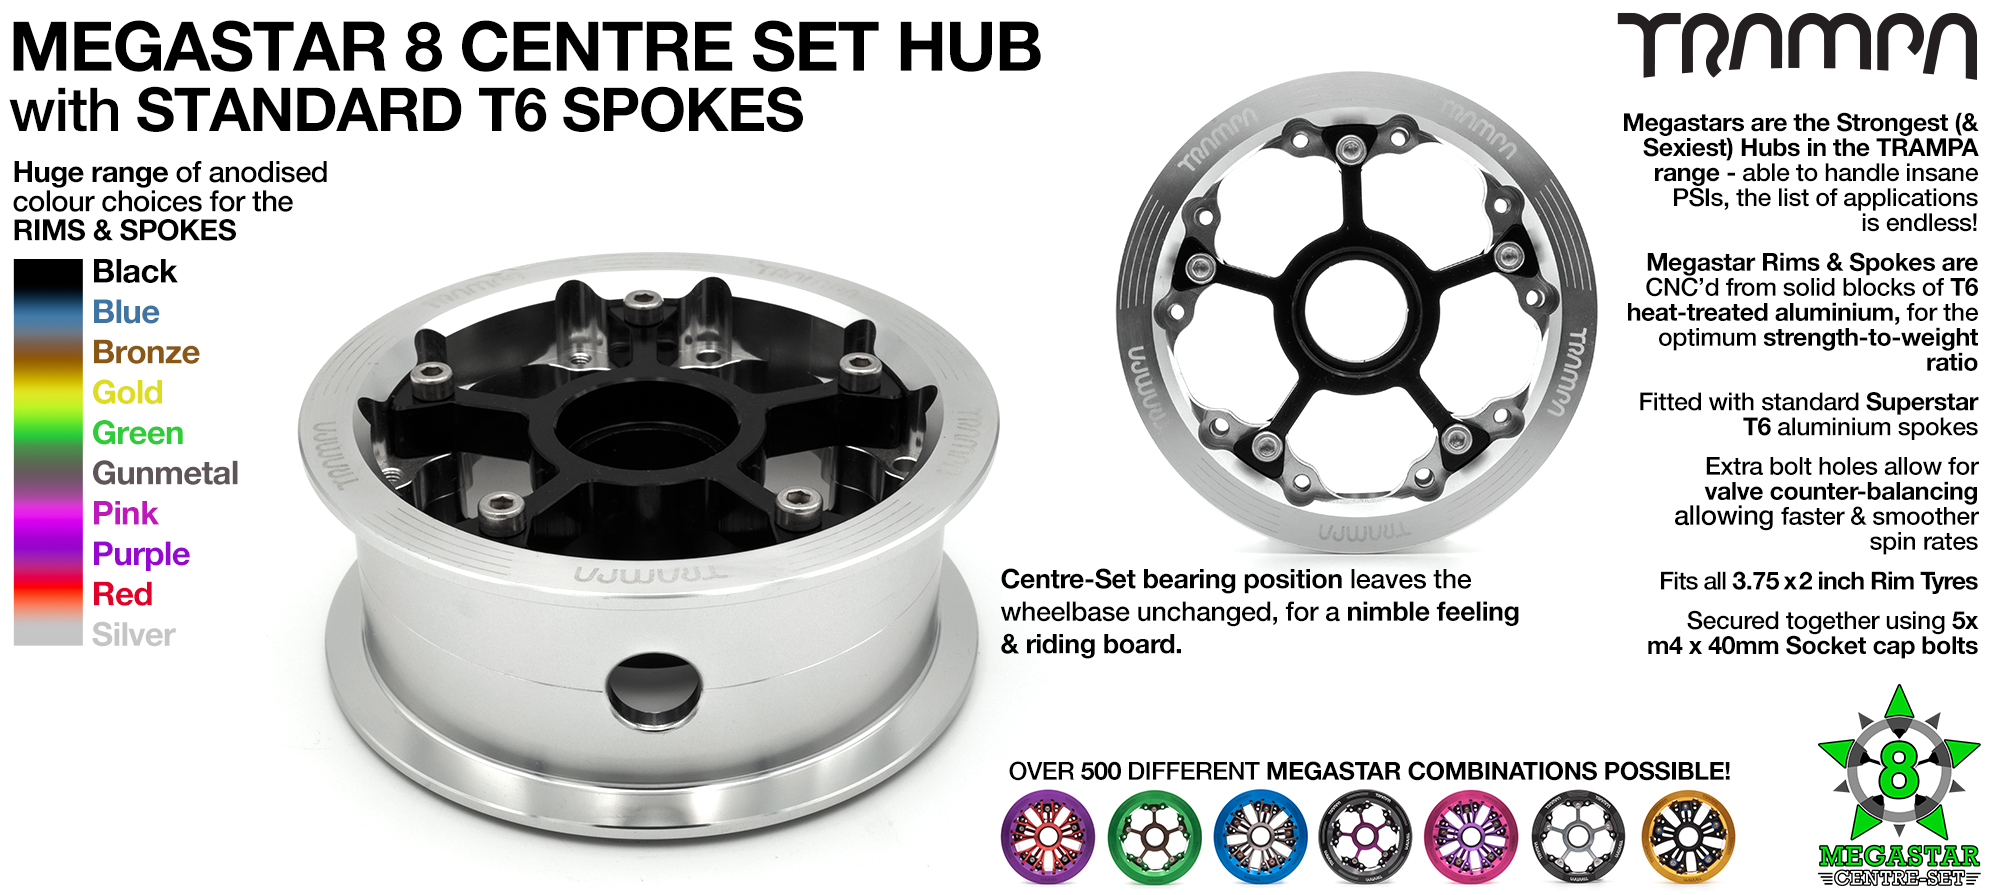 Custom 8 Inch CENTRE-SET MEGASTAR HUB! Build the MEGASTAR Hub of your dreams!! Any combination possible...